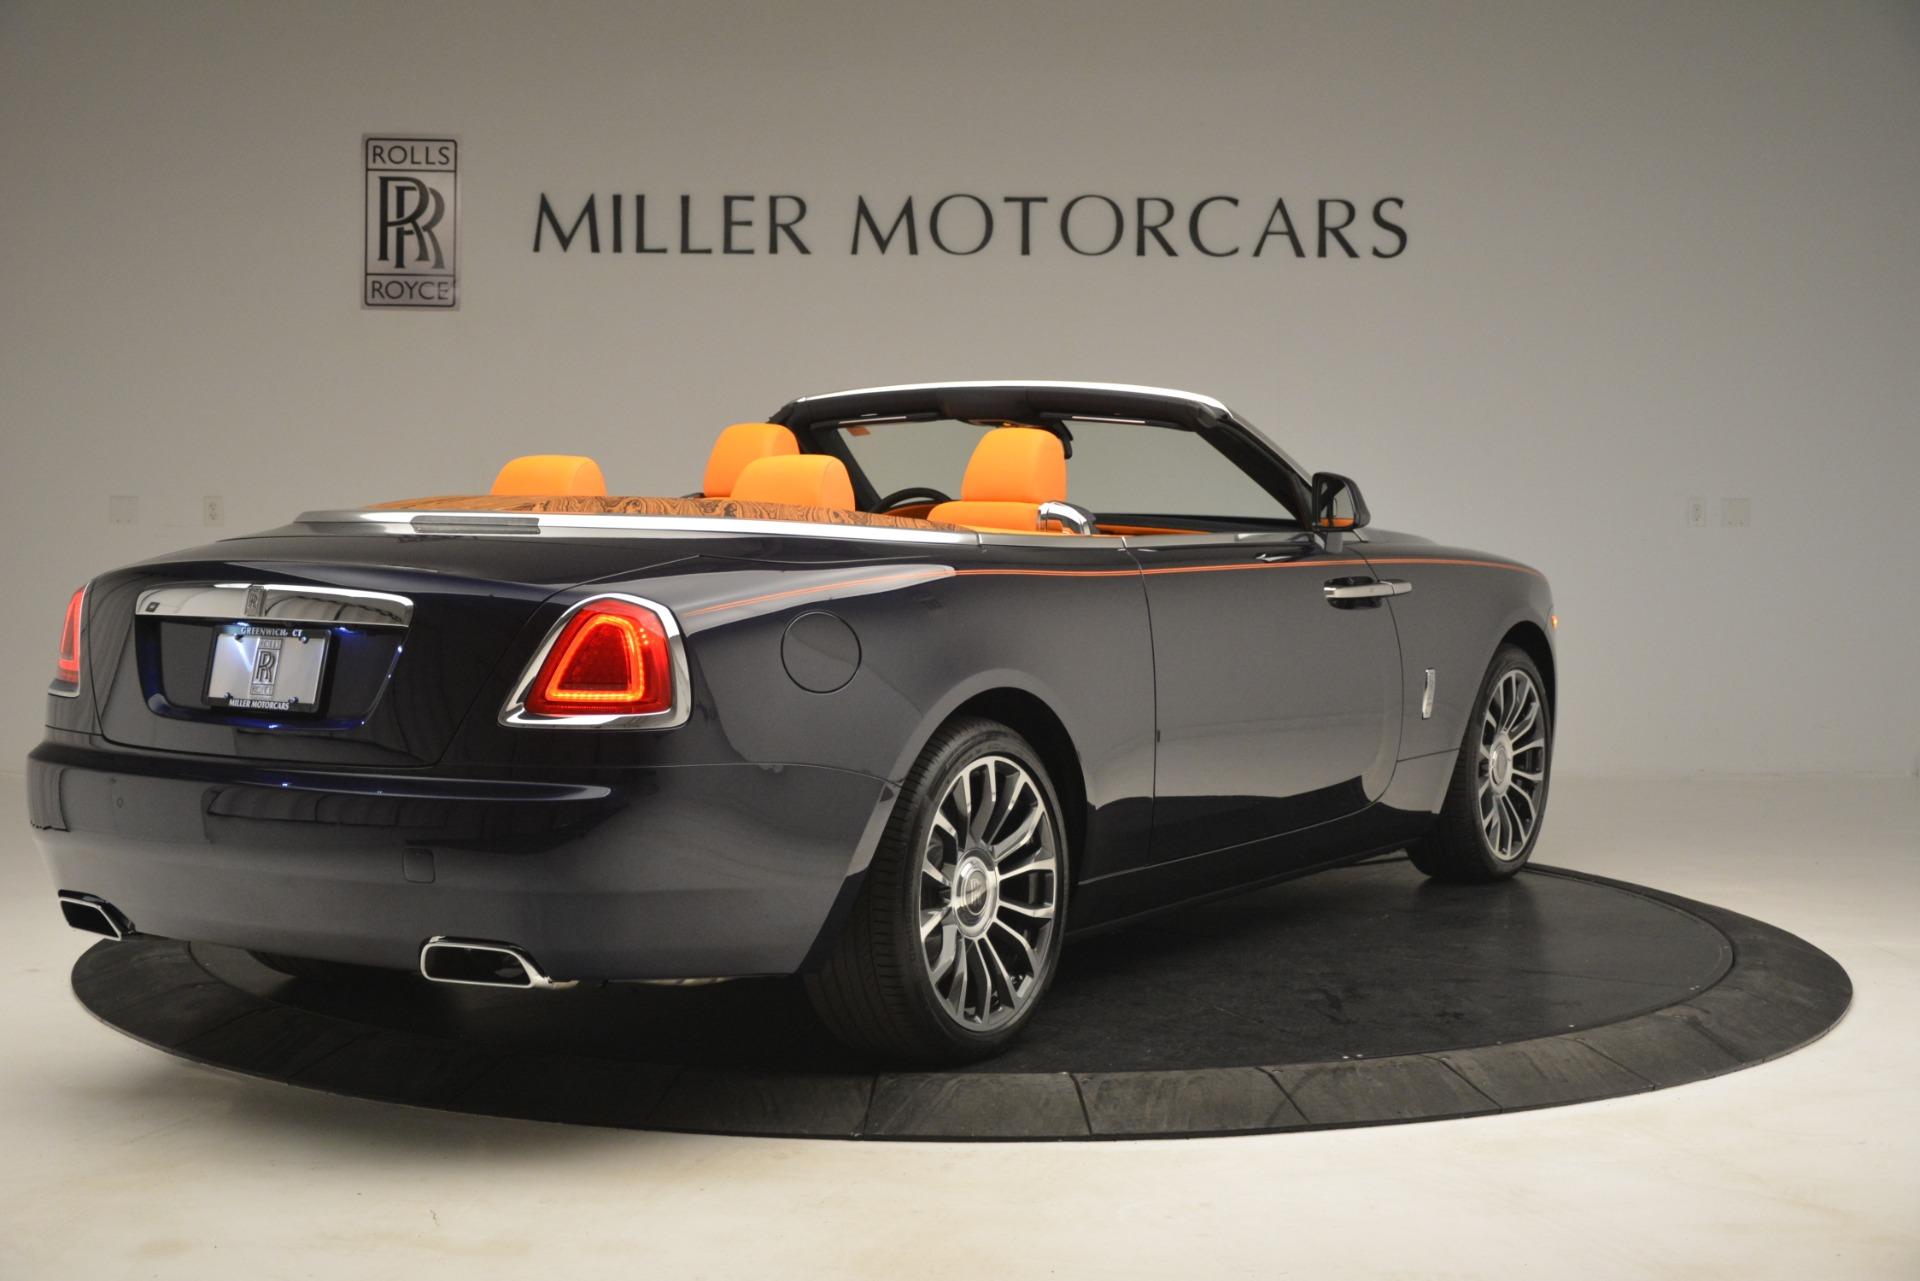 New 2019 Rolls-Royce Dawn  For Sale In Greenwich, CT 2701_p9